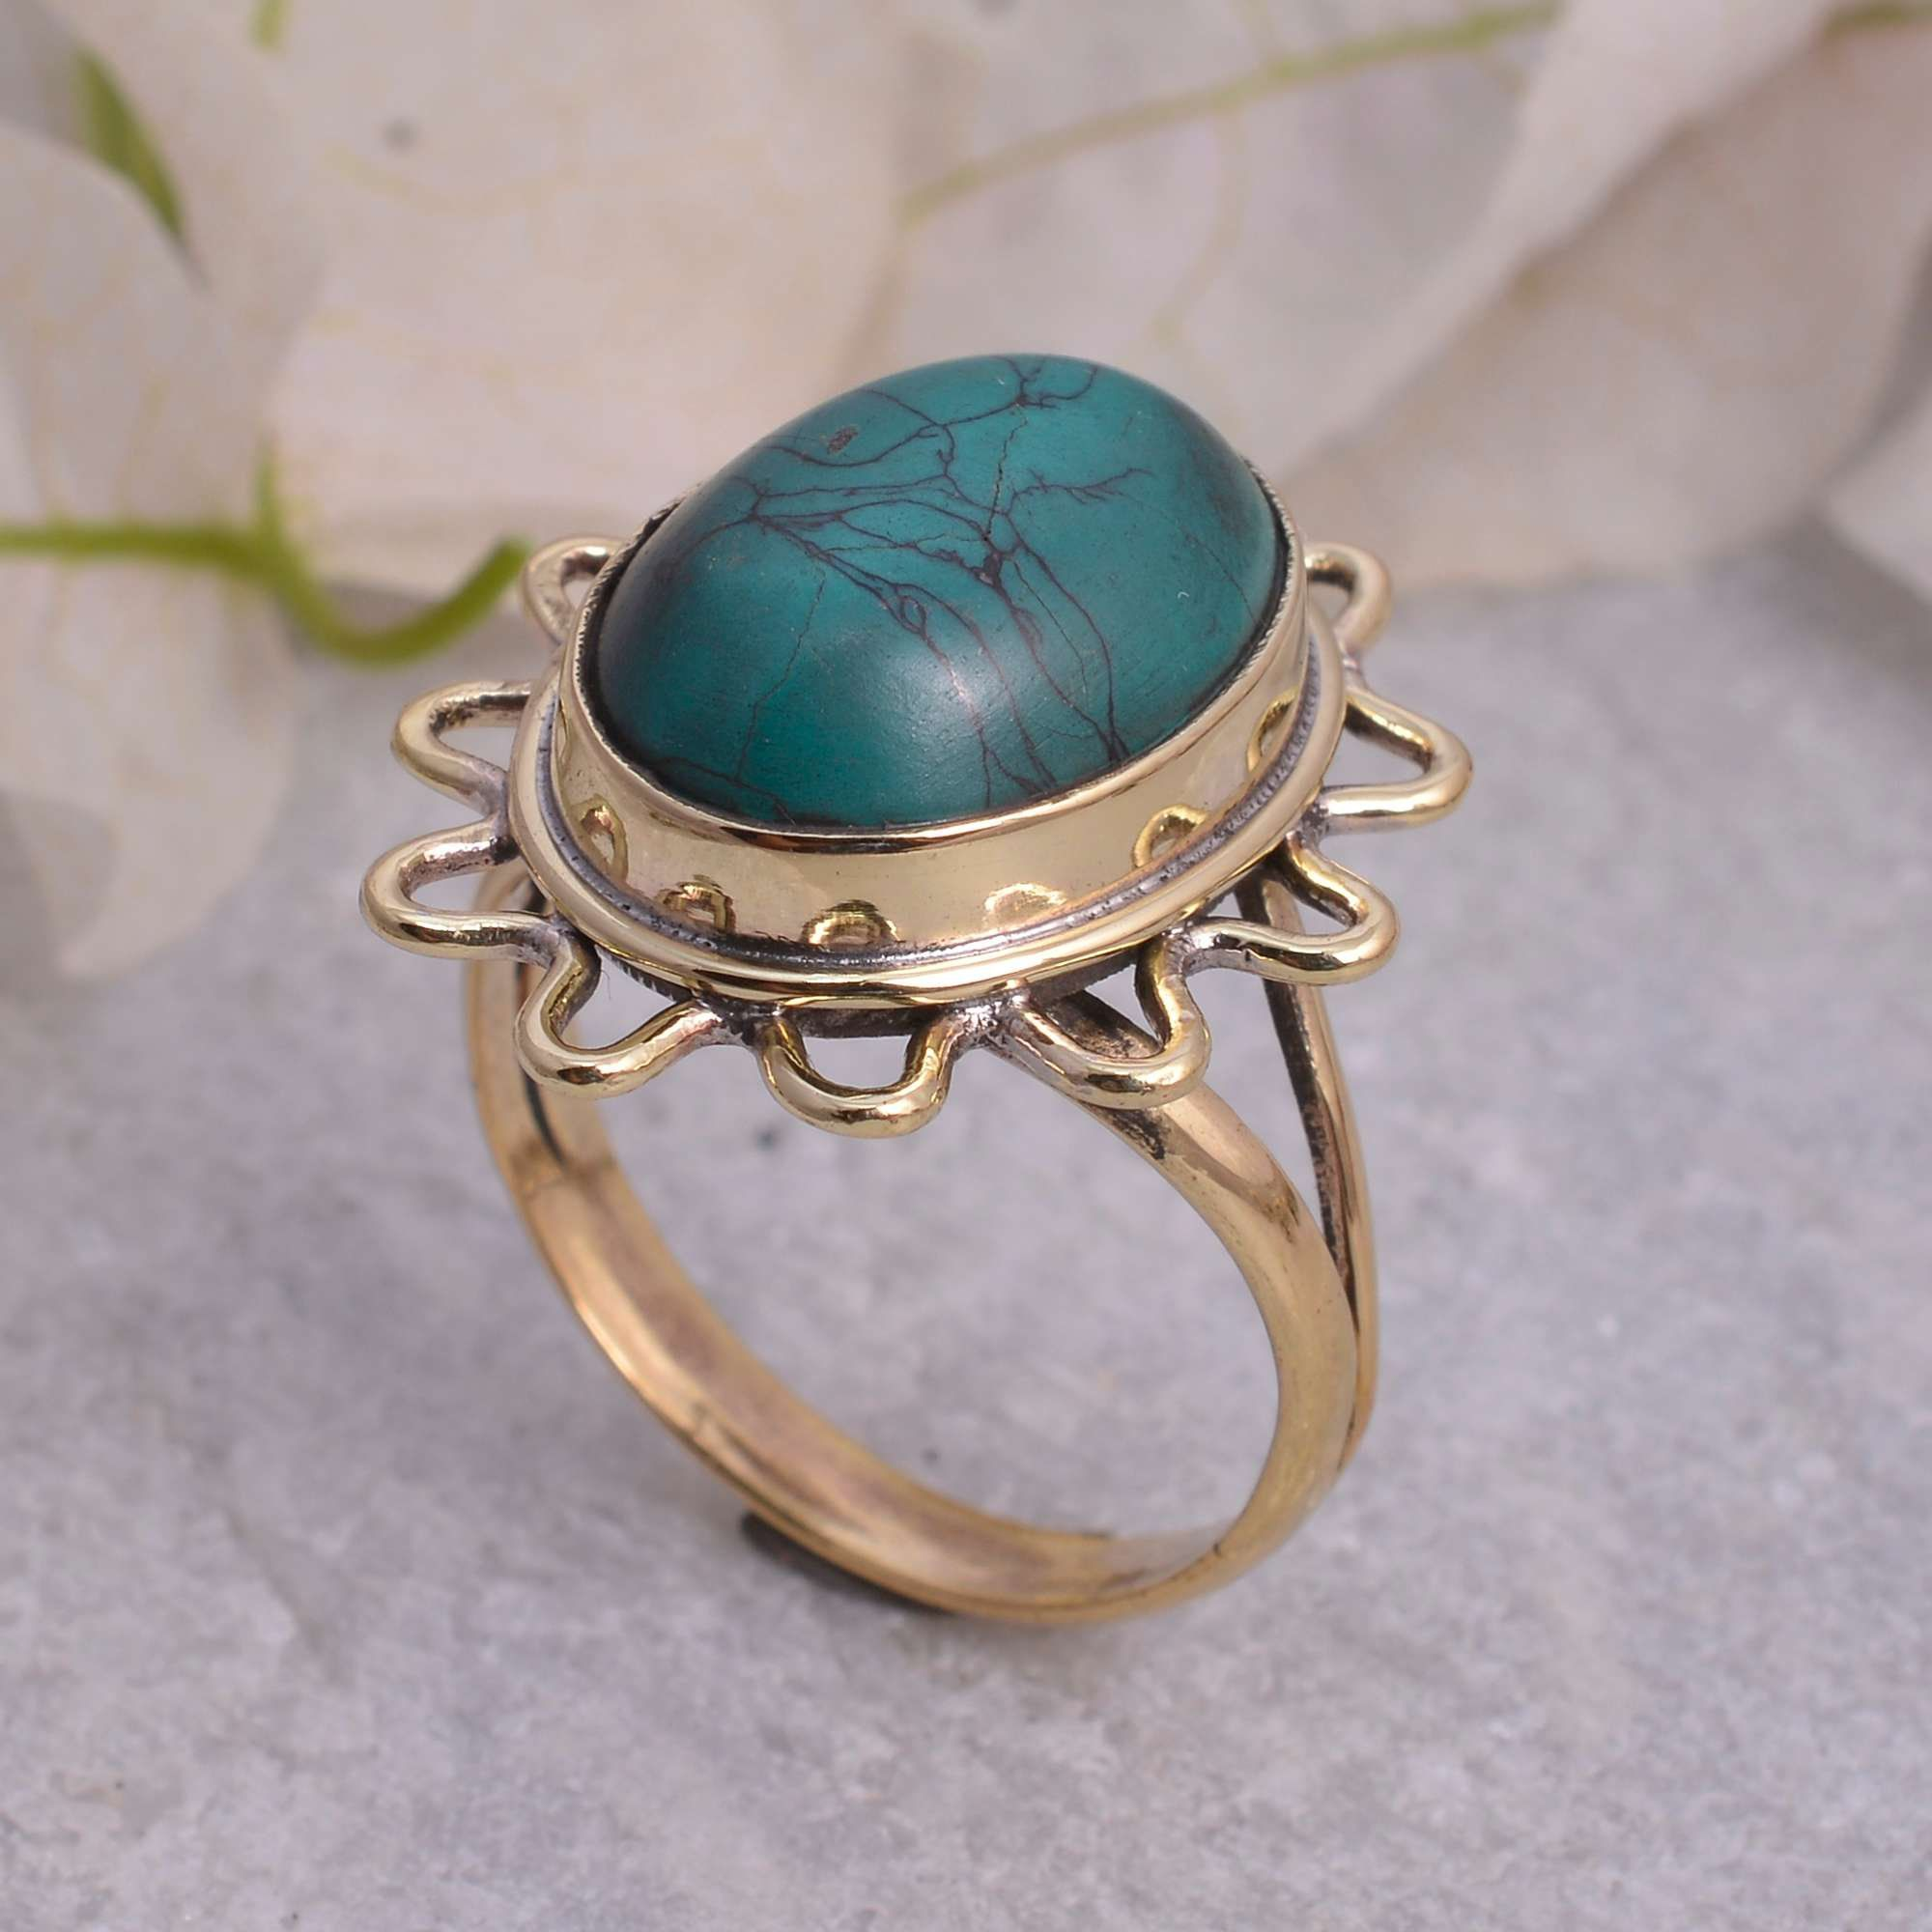 Boho Rings Sterling Silver Ring purple turquoise gemstone ring handmade rings vintage ring